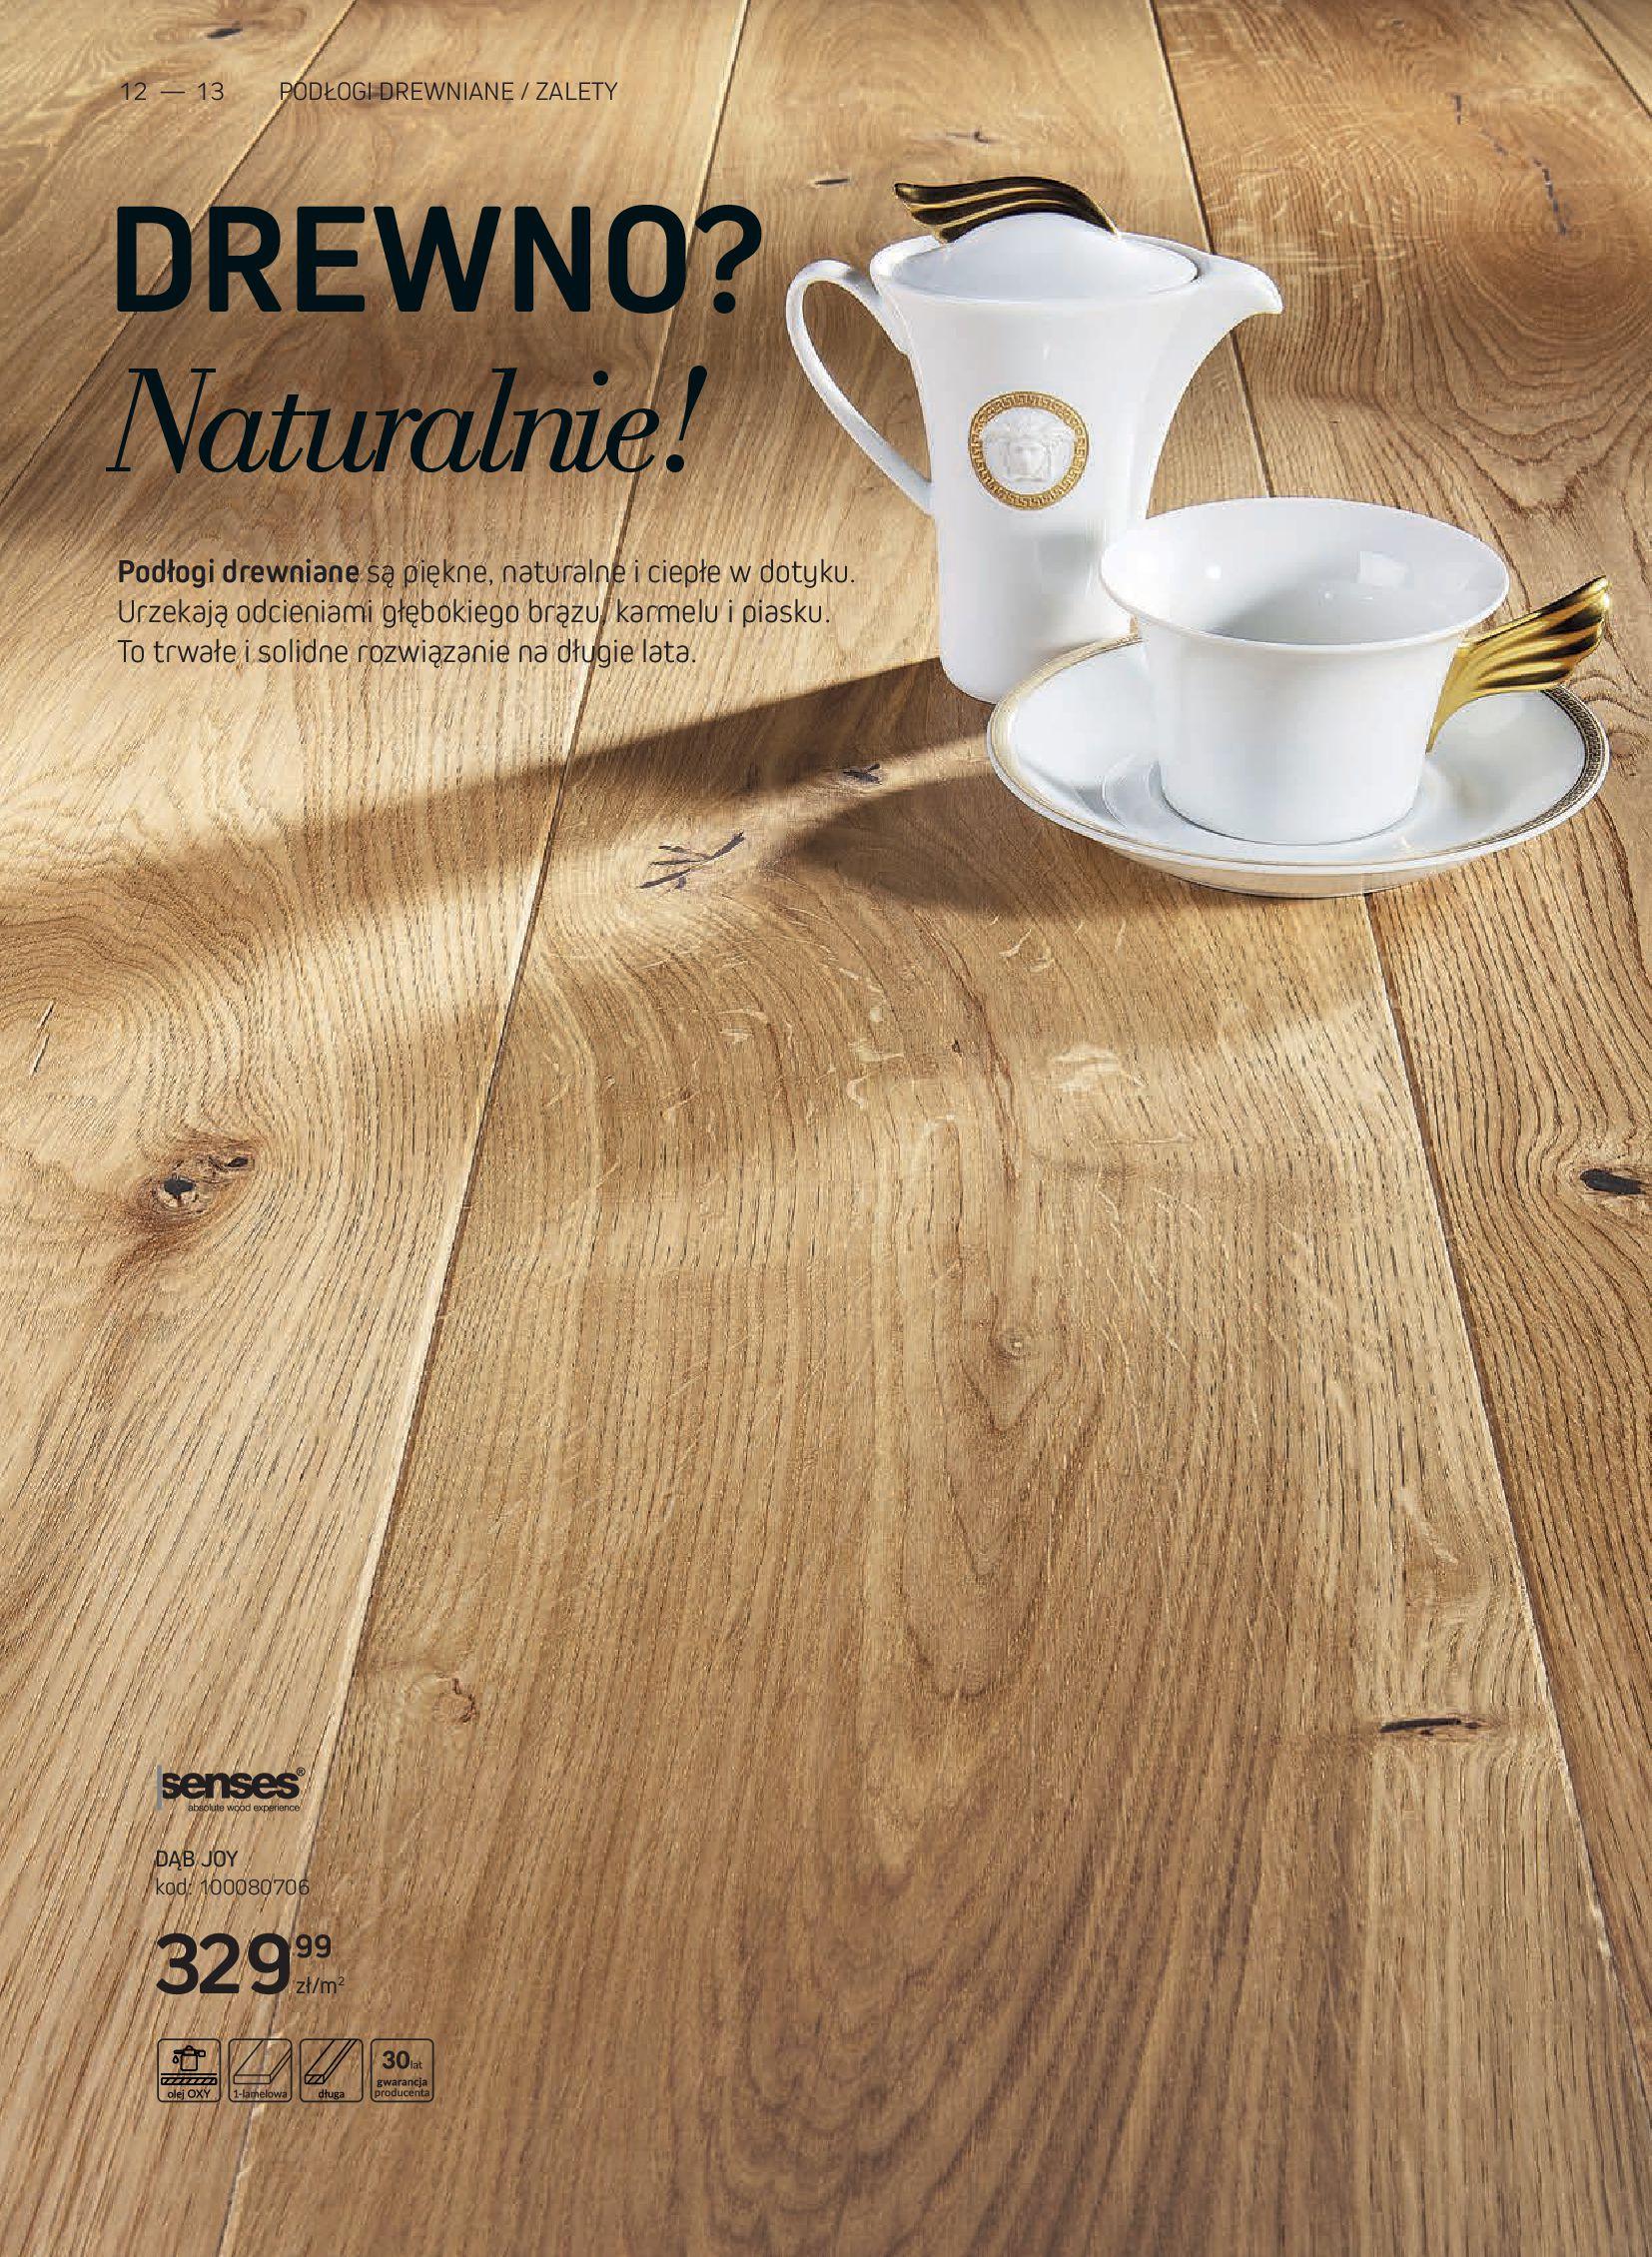 Gazetka Komfort: Gazetka Komfort - Katalog podłogi i drzwi 2021-06-16 page-12